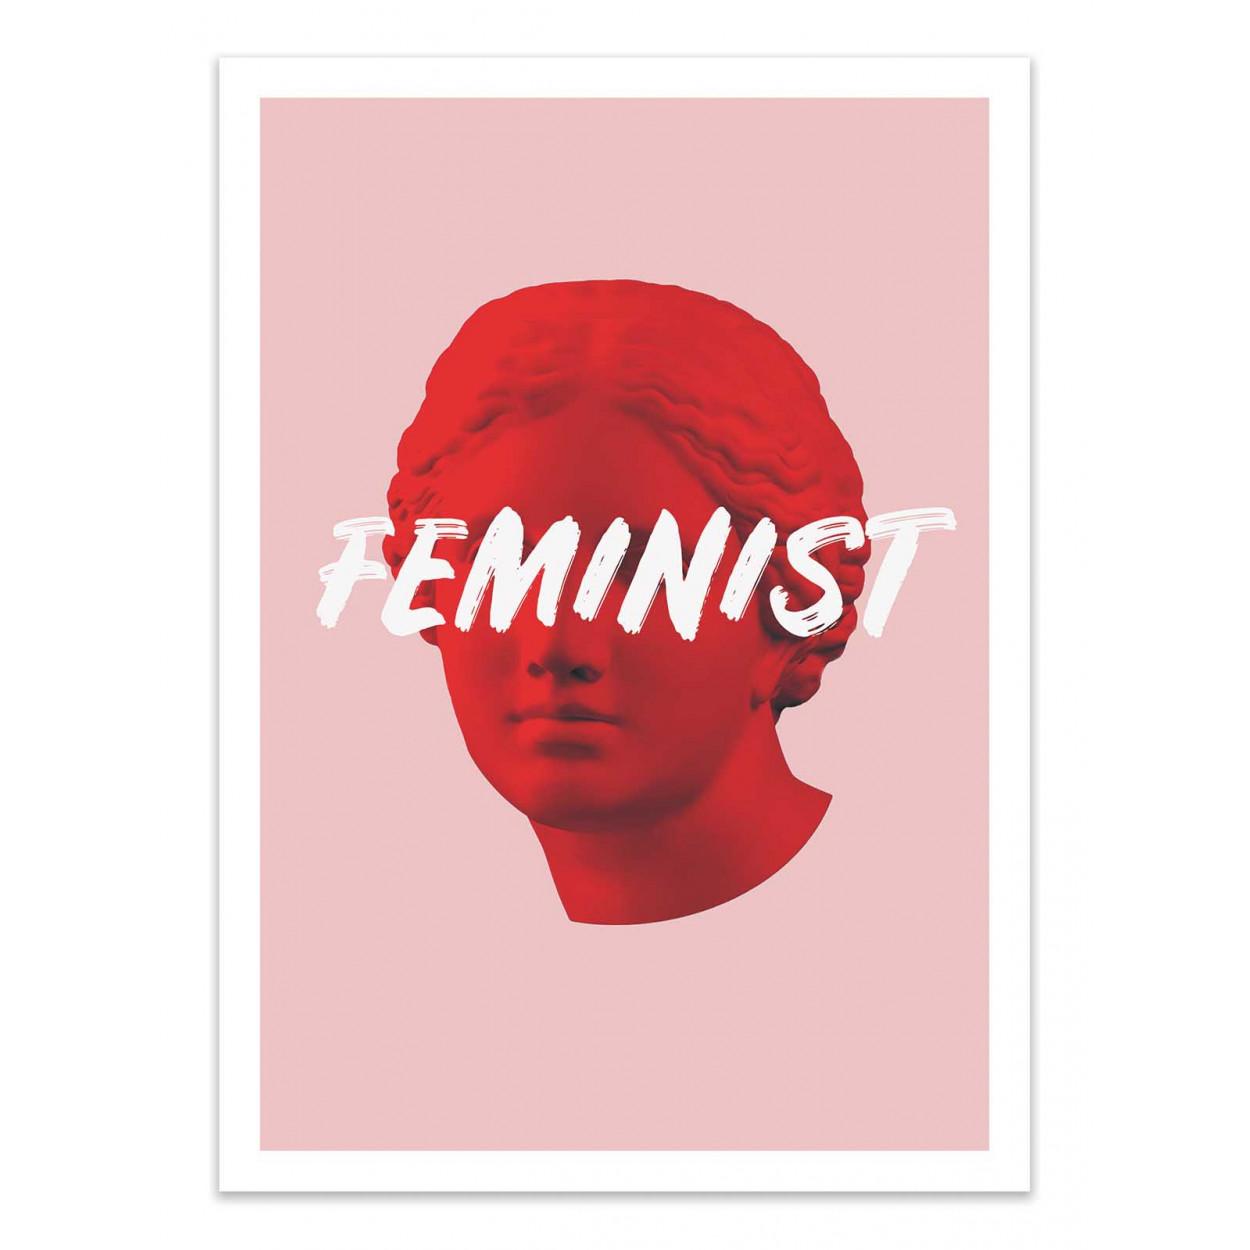 VENUS FEMINIST - RUBY AND B -  Affiche d'art 50 x 70 cm